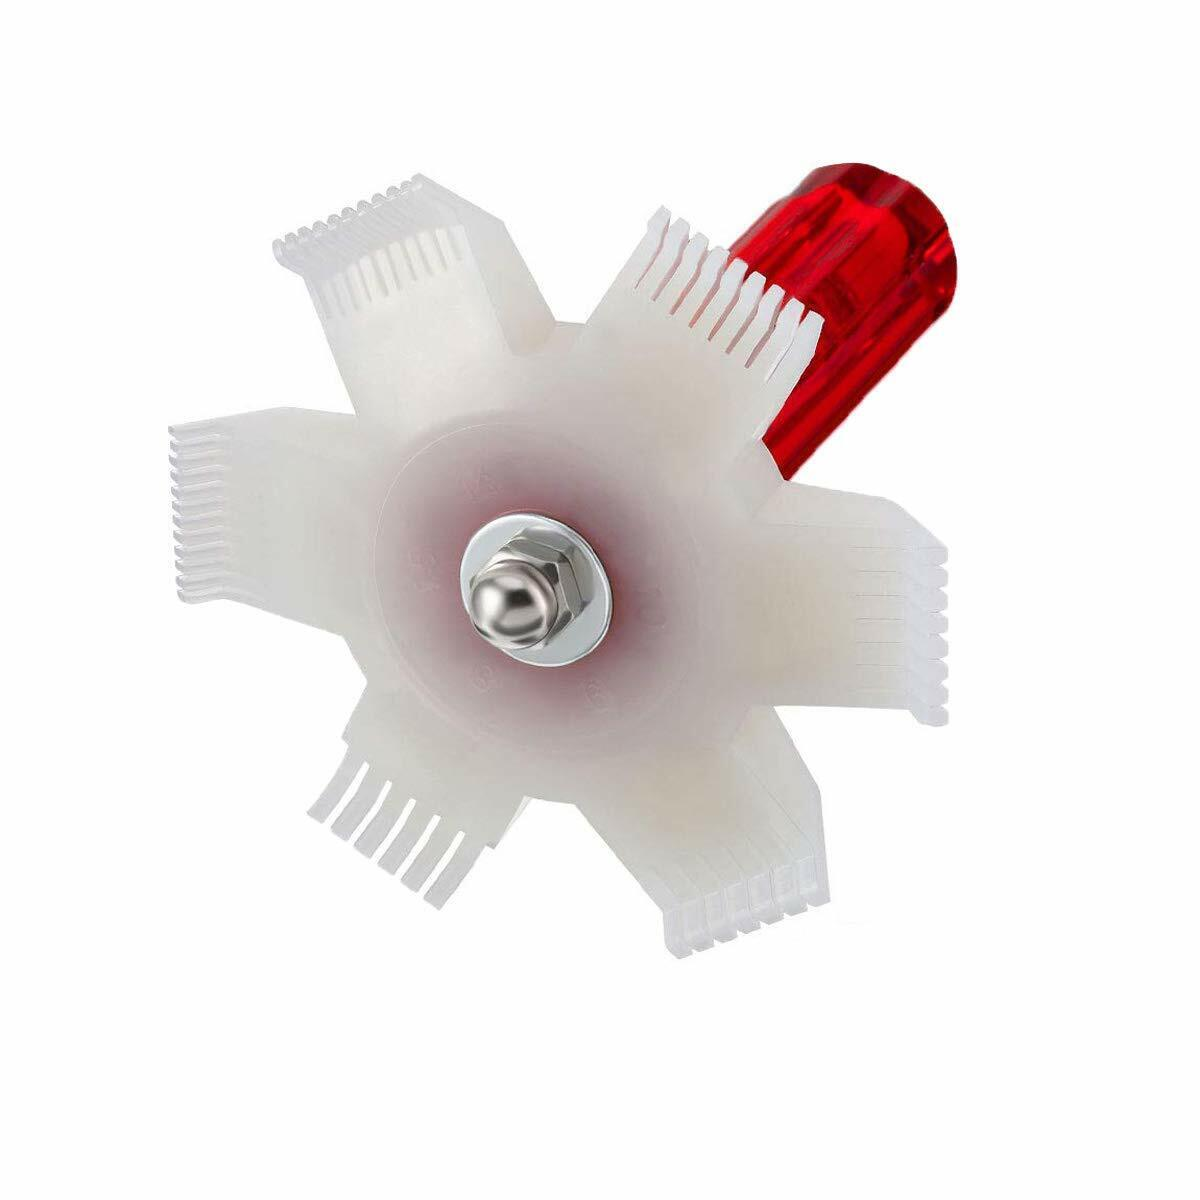 Air Conditioner Fin Repair Comb Condenser Comb Refrigeration